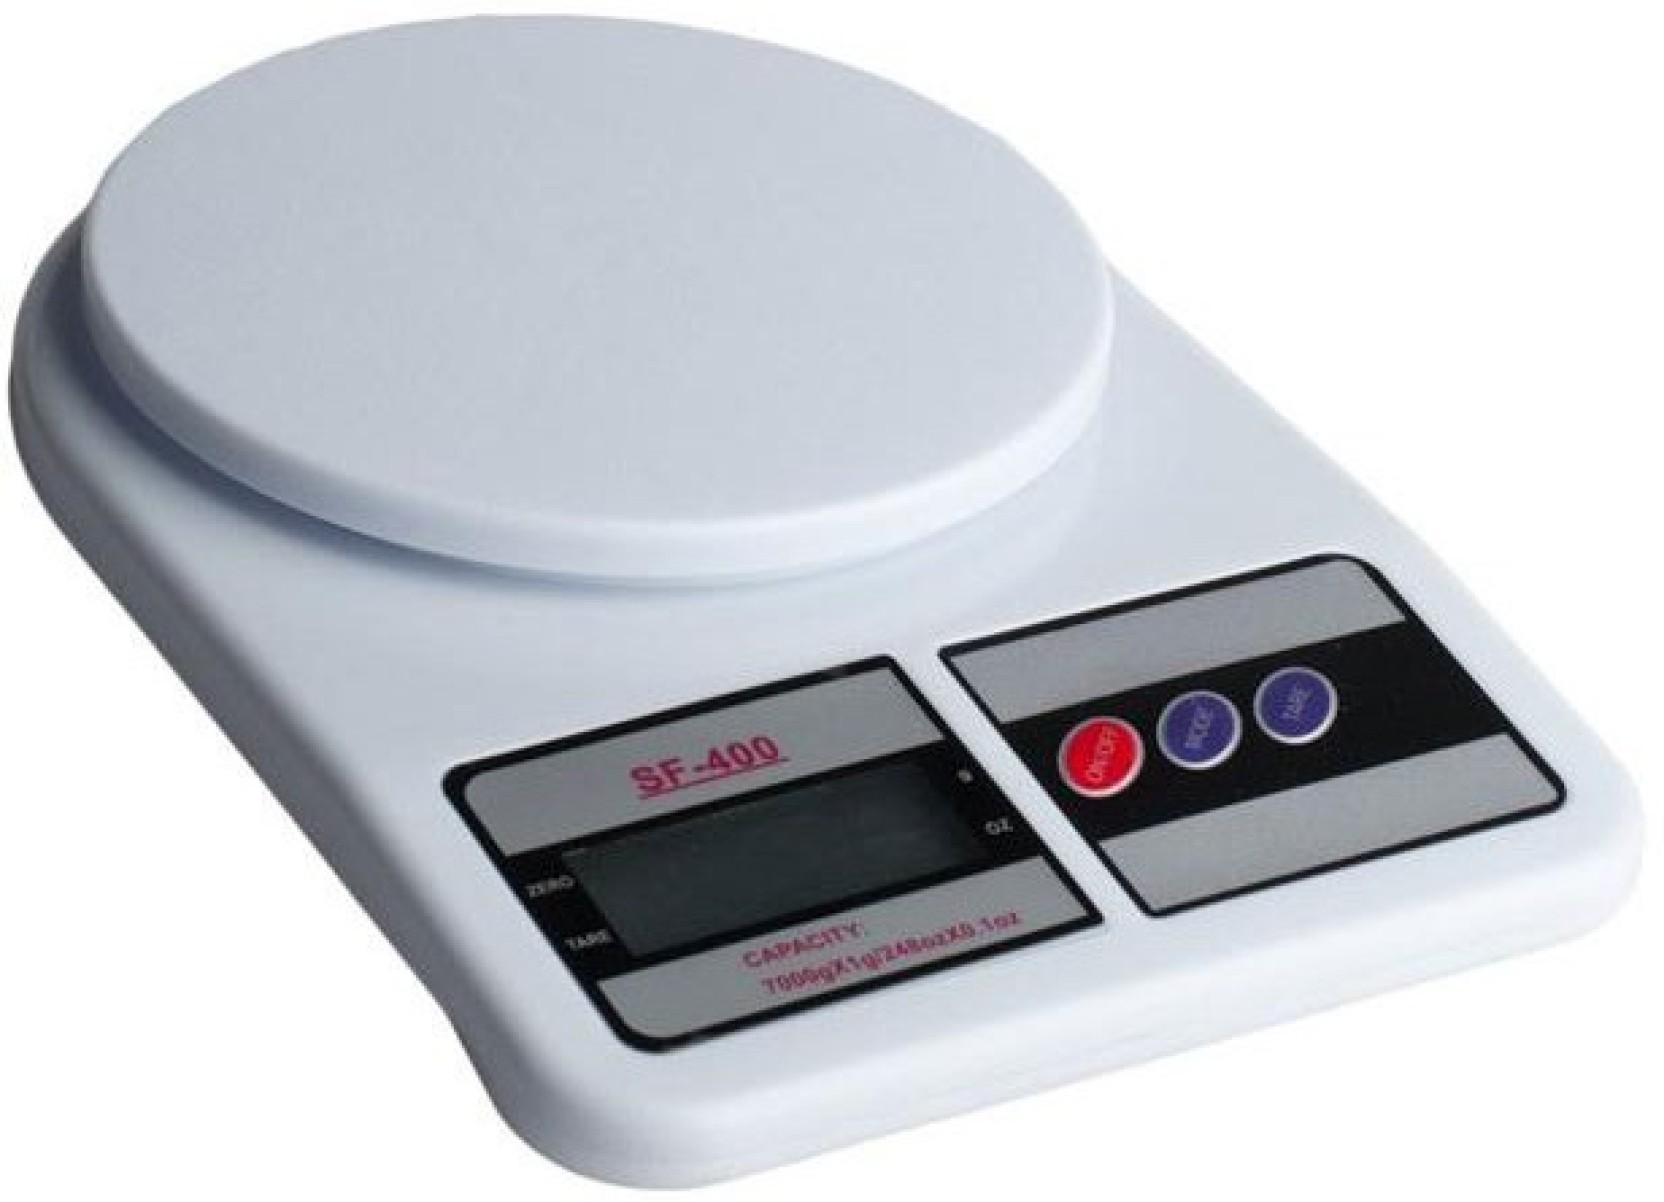 Vivir Electronic Kitchen Digital Weighing Scale 10 Kg Weight Measure ...